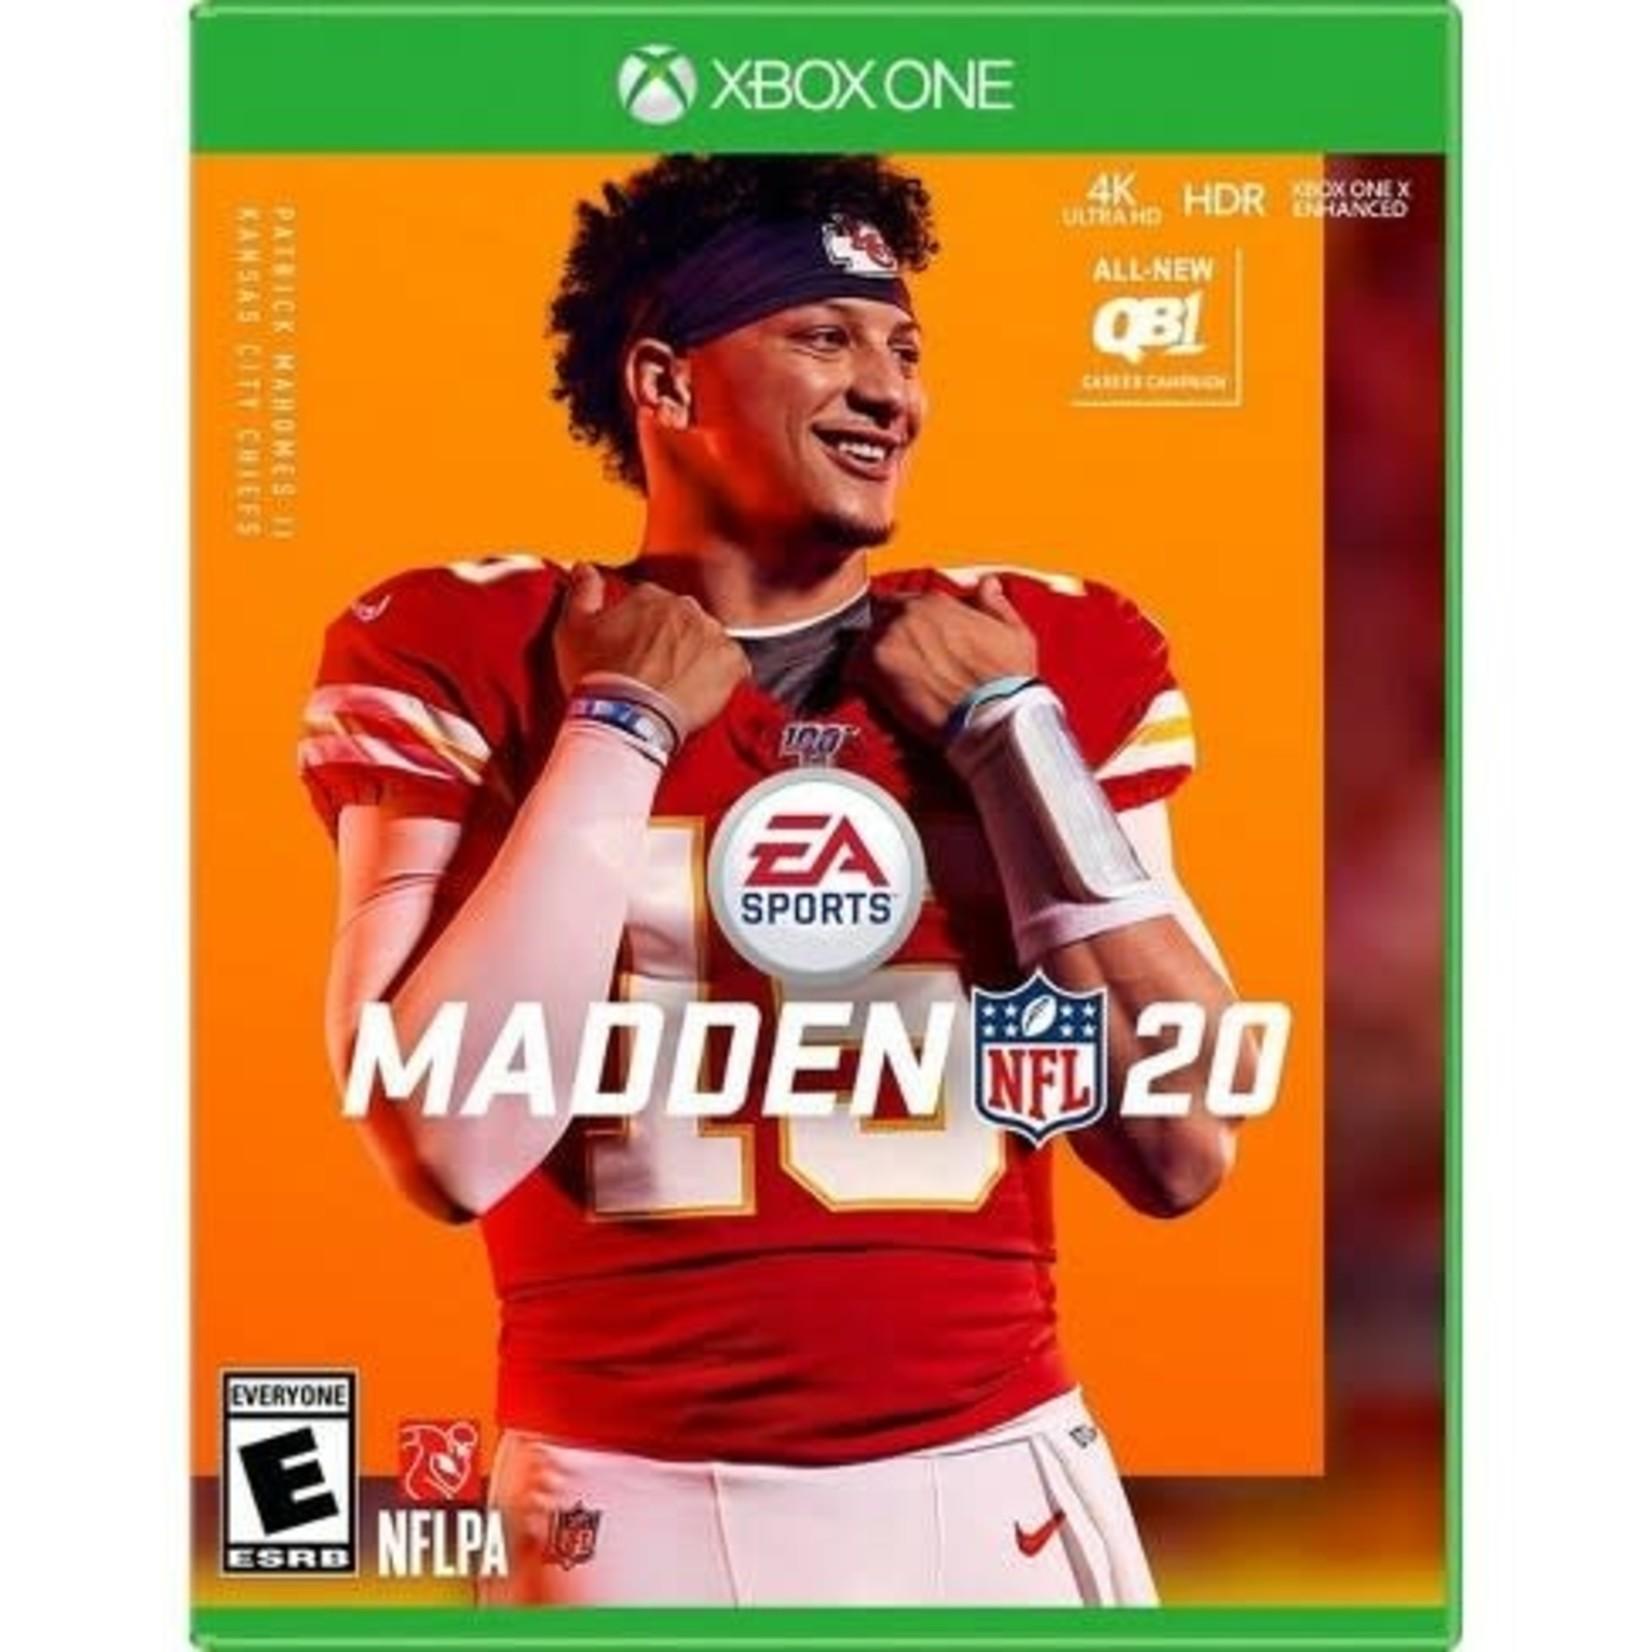 XB1-Madden NFL 20